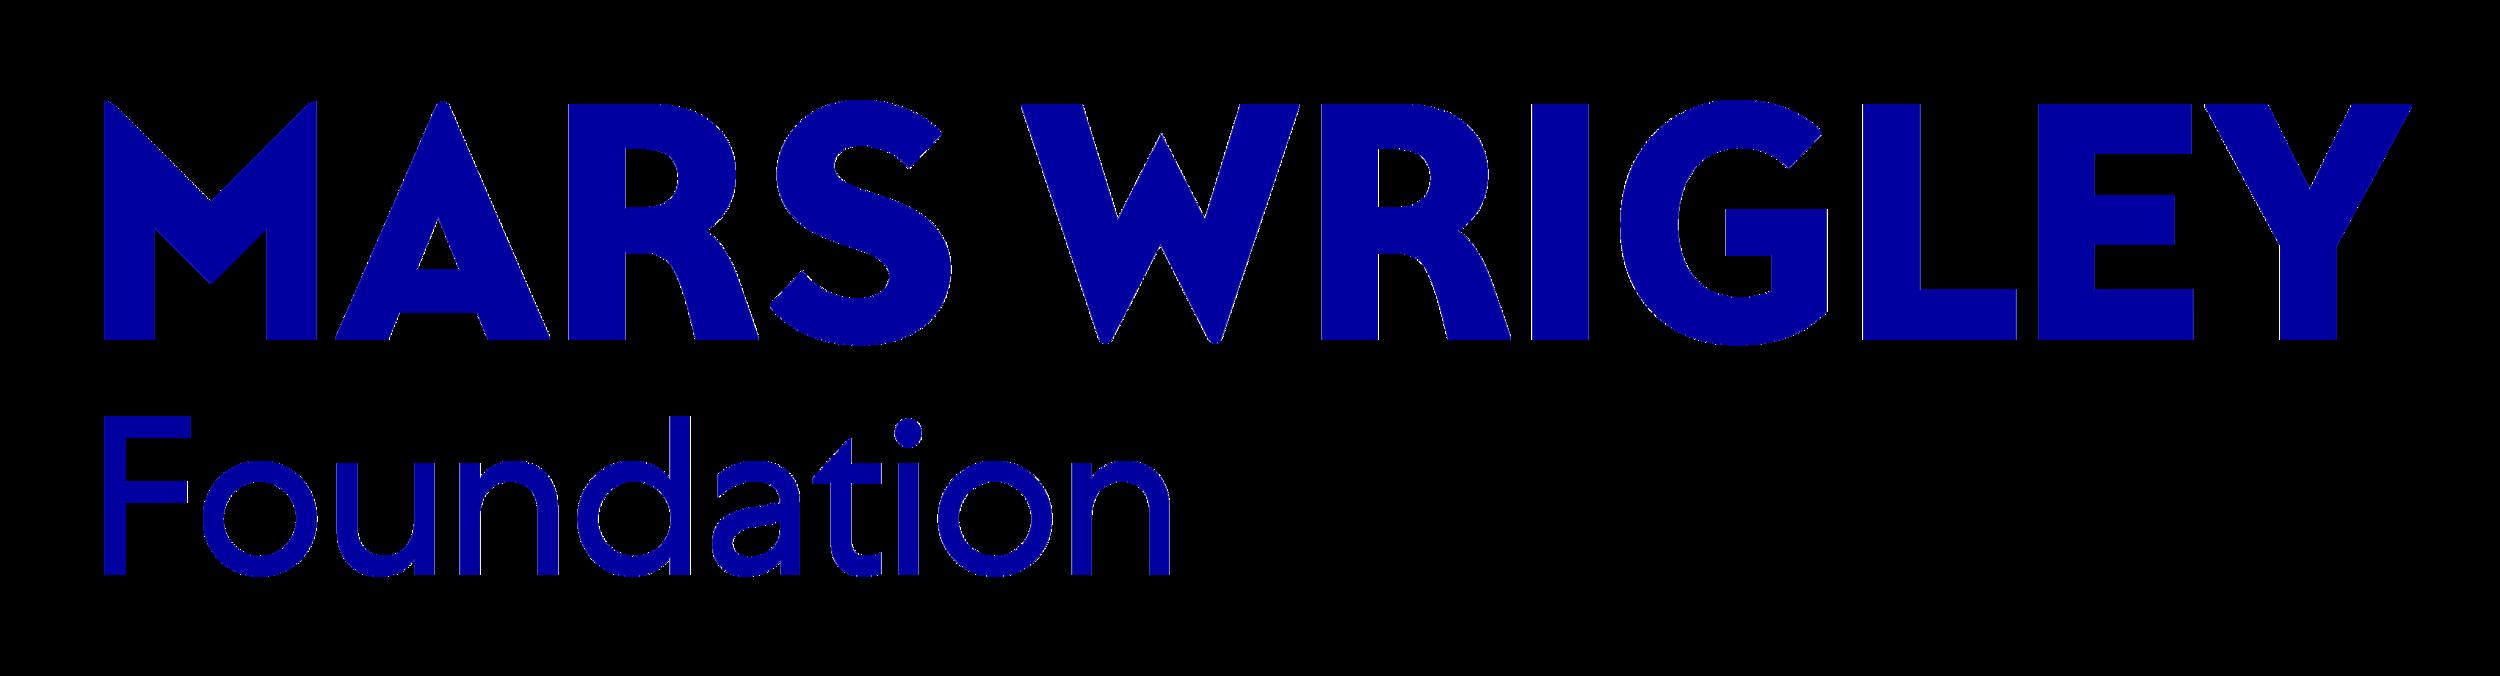 Mars Wrigley Foundation Lockup RGB.png